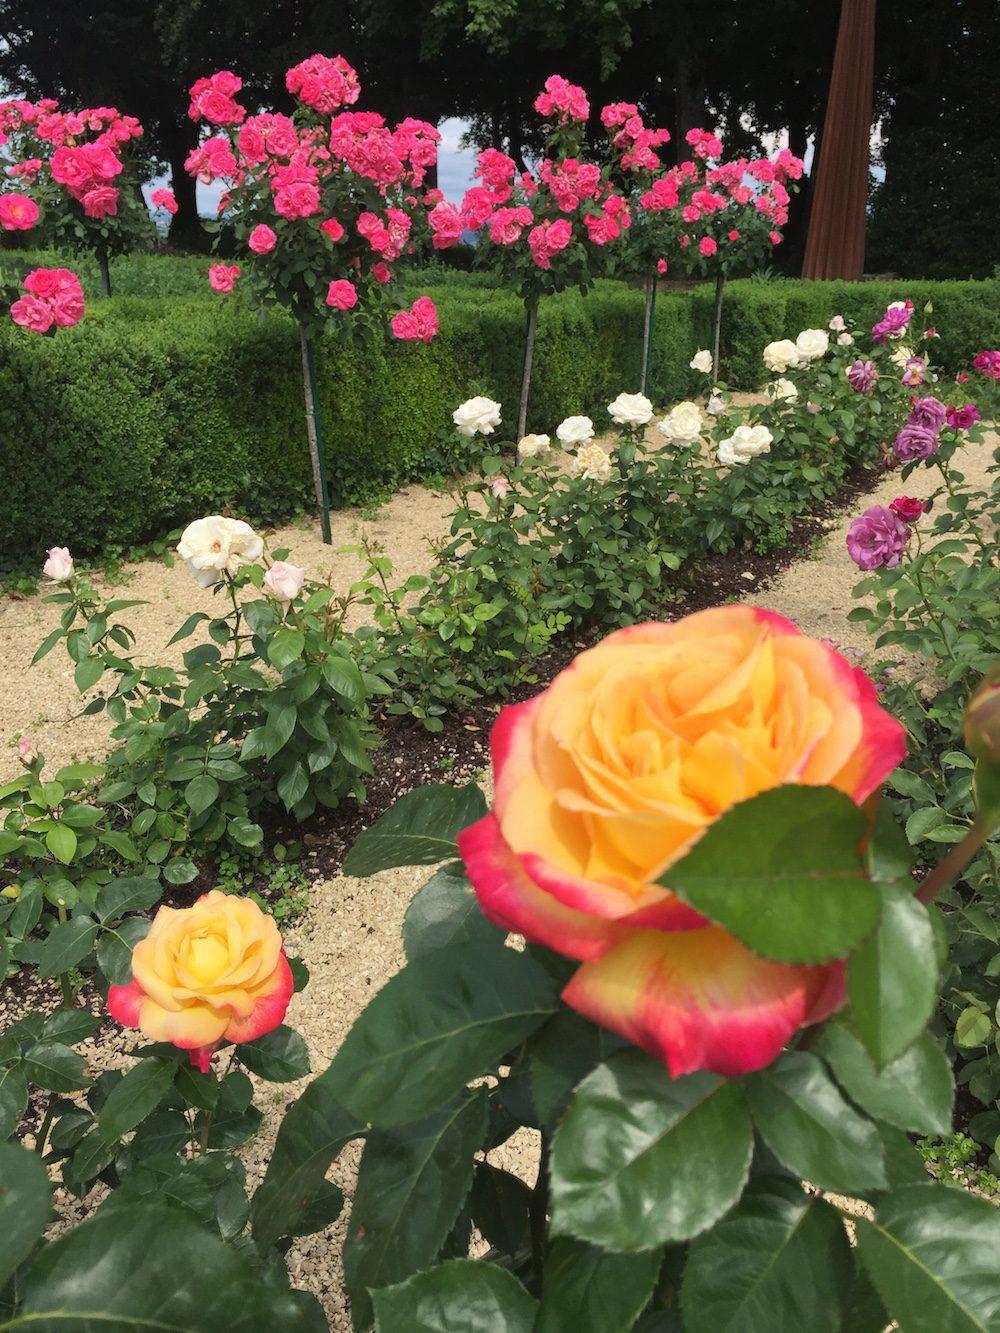 Gros plan des rosiers blanc, rose et orange.